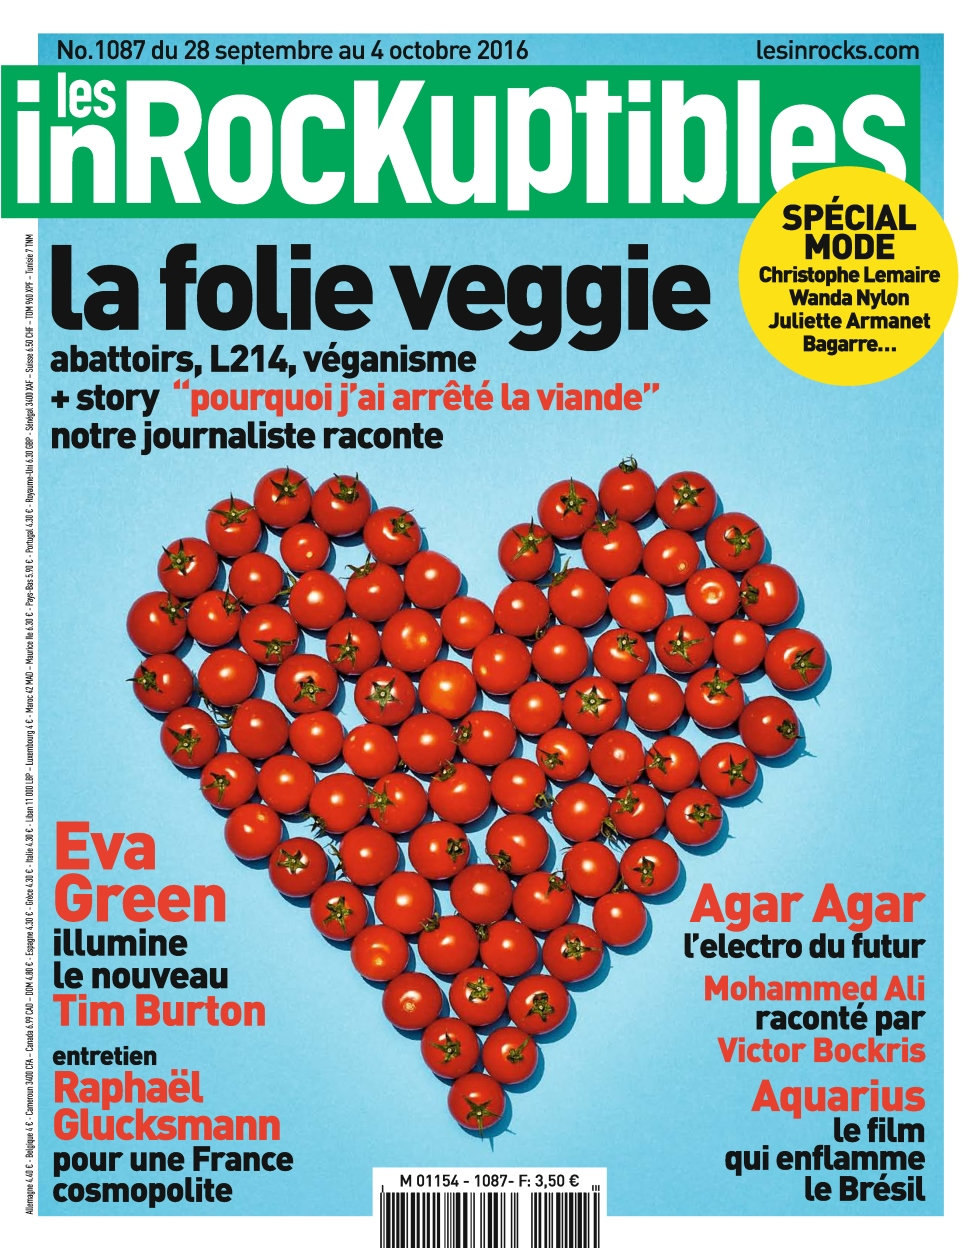 Les Inrockuptibles N°1087 - 28 Septembre au 04 Octobre 2016